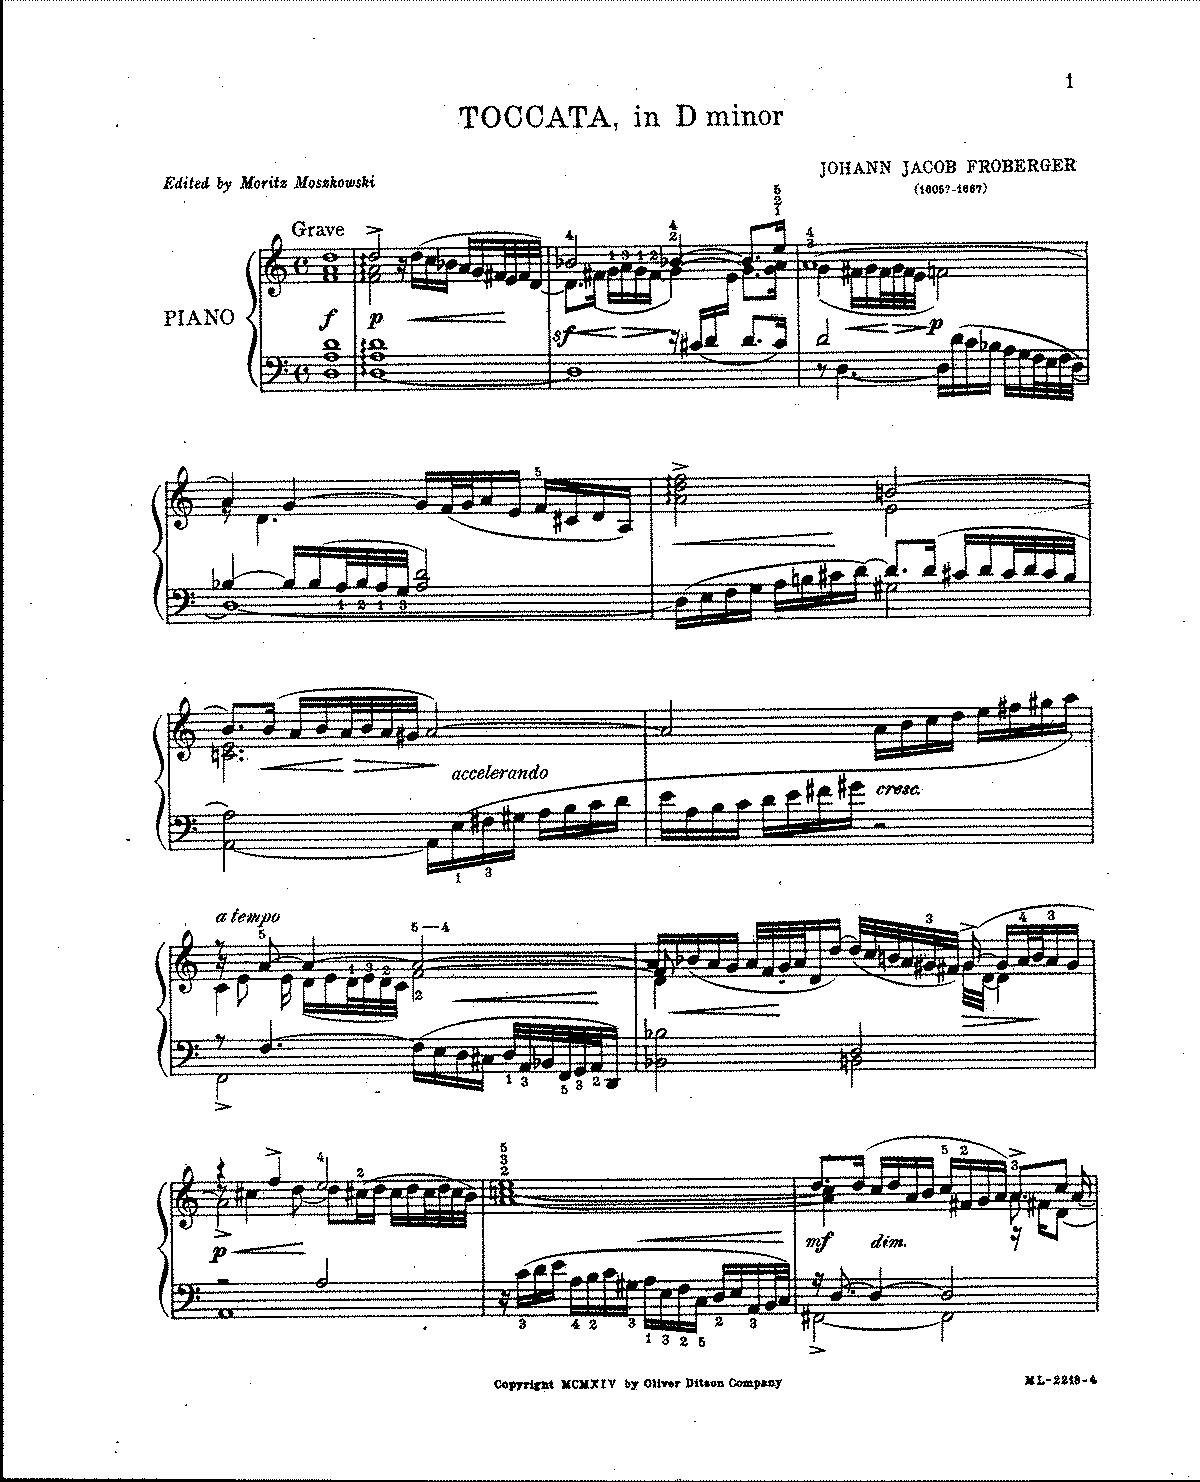 Free Sheet Music Public Domain: Toccatas (Froberger, Johann Jacob)